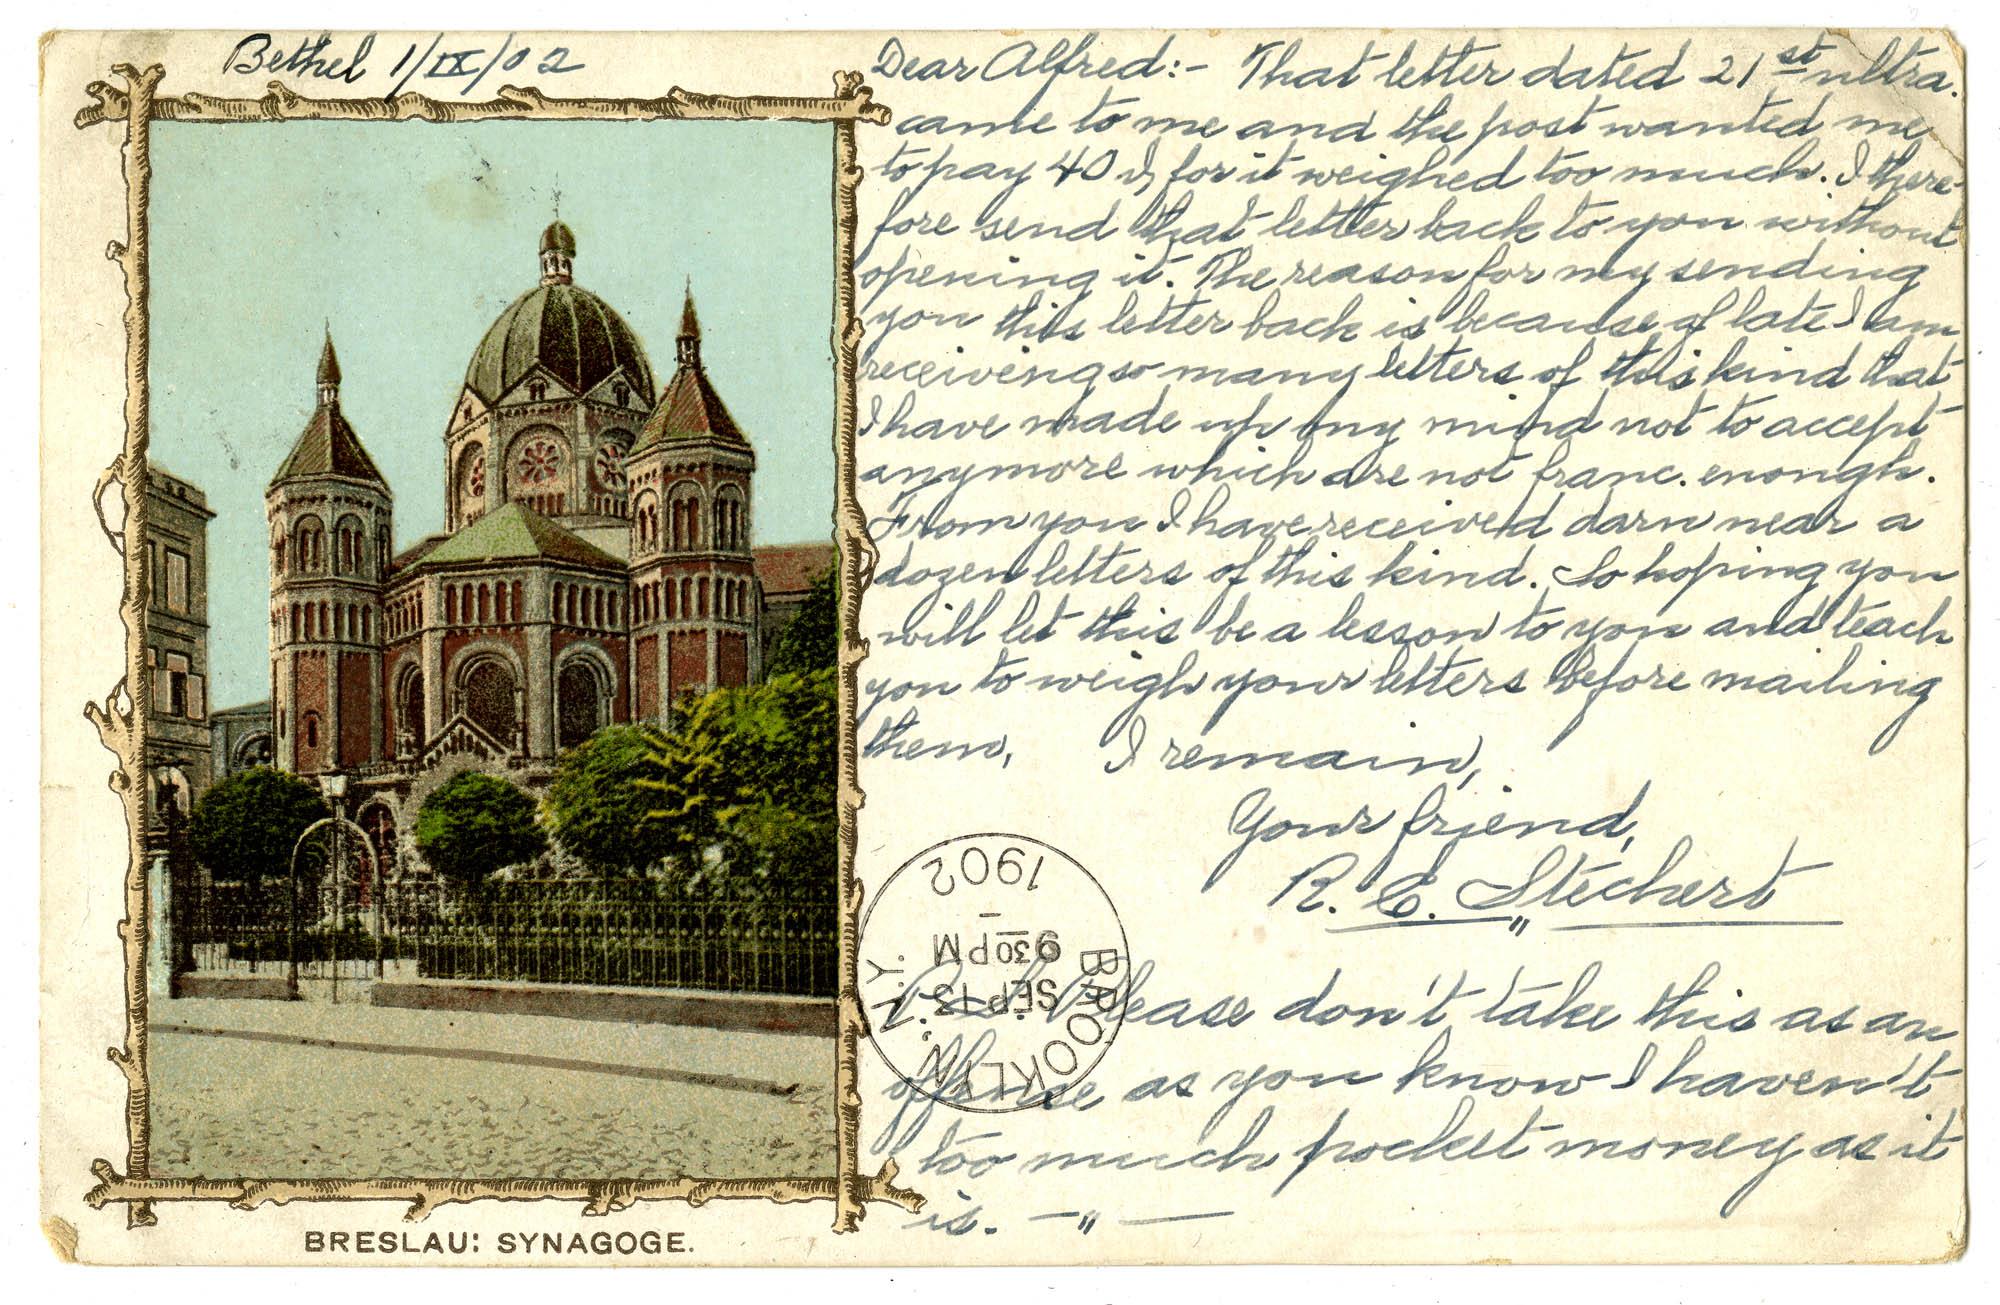 Breslau: Synagoge.